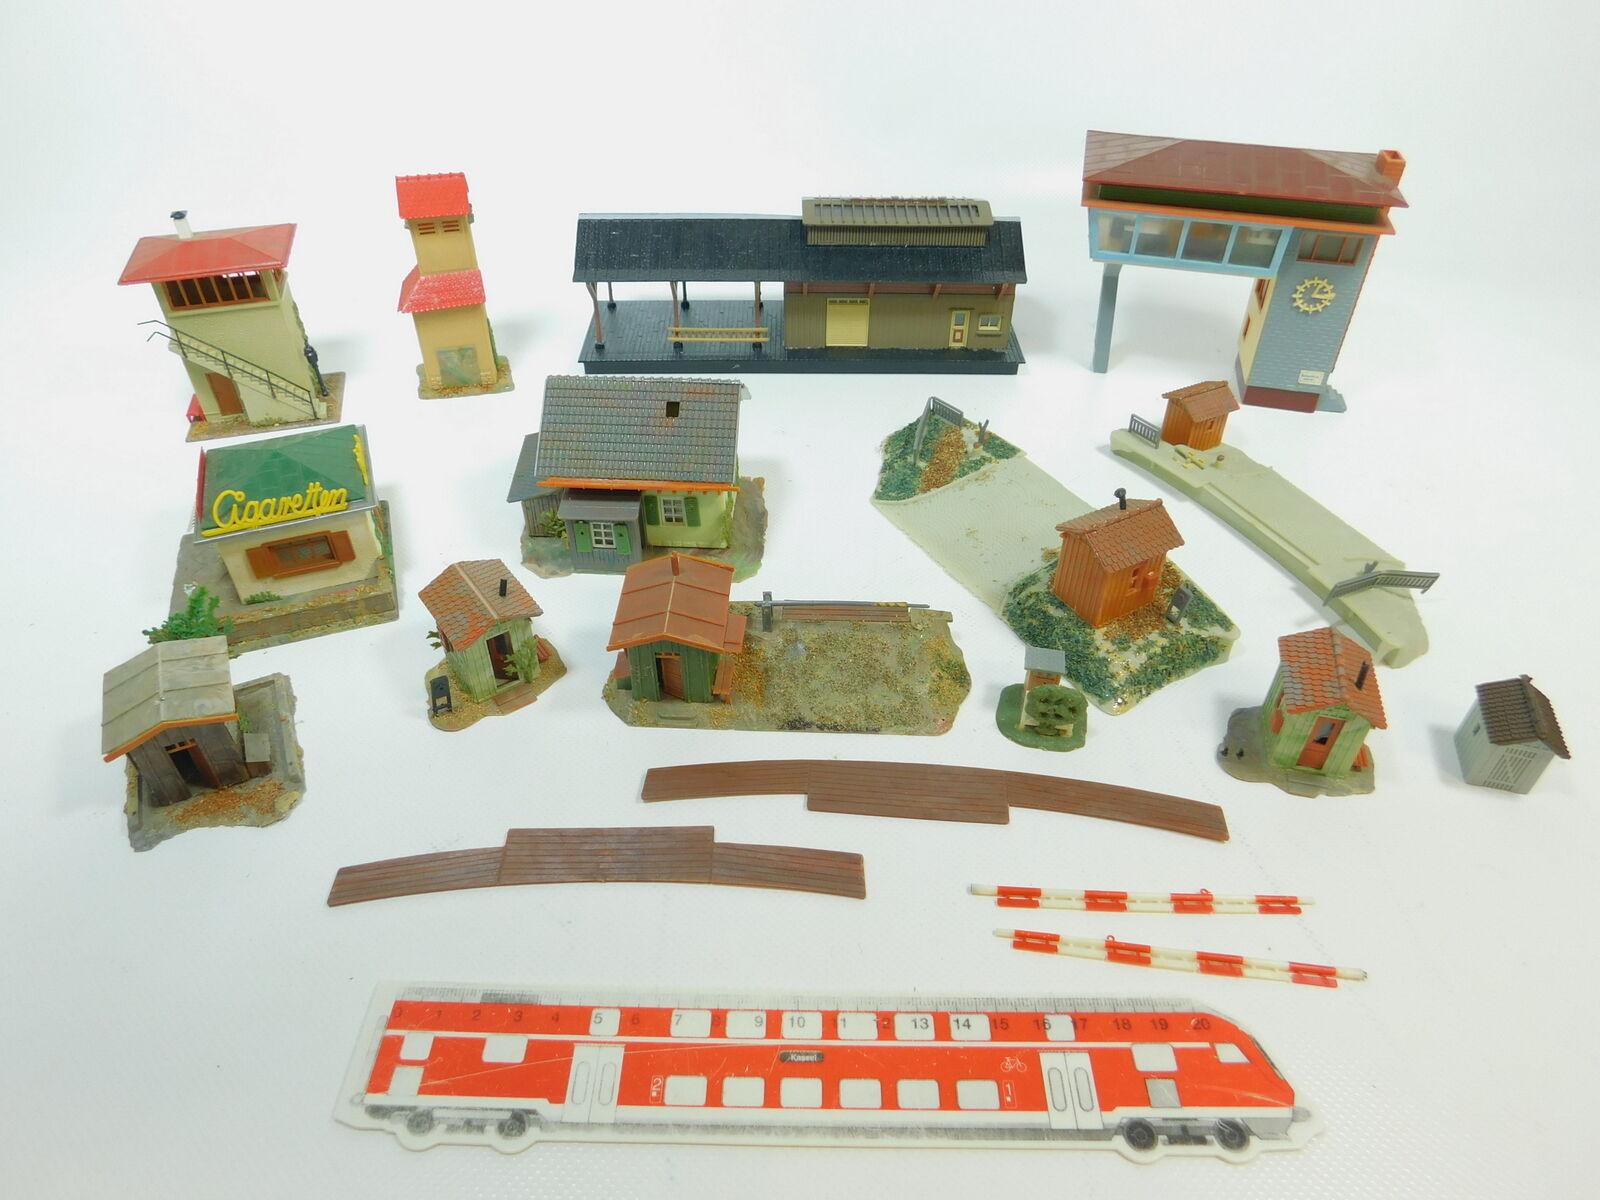 BE922-1  12x Faller H0 Modelle Stellwerke, Kiosk, Wärterhäuschen, Bahnübergänge